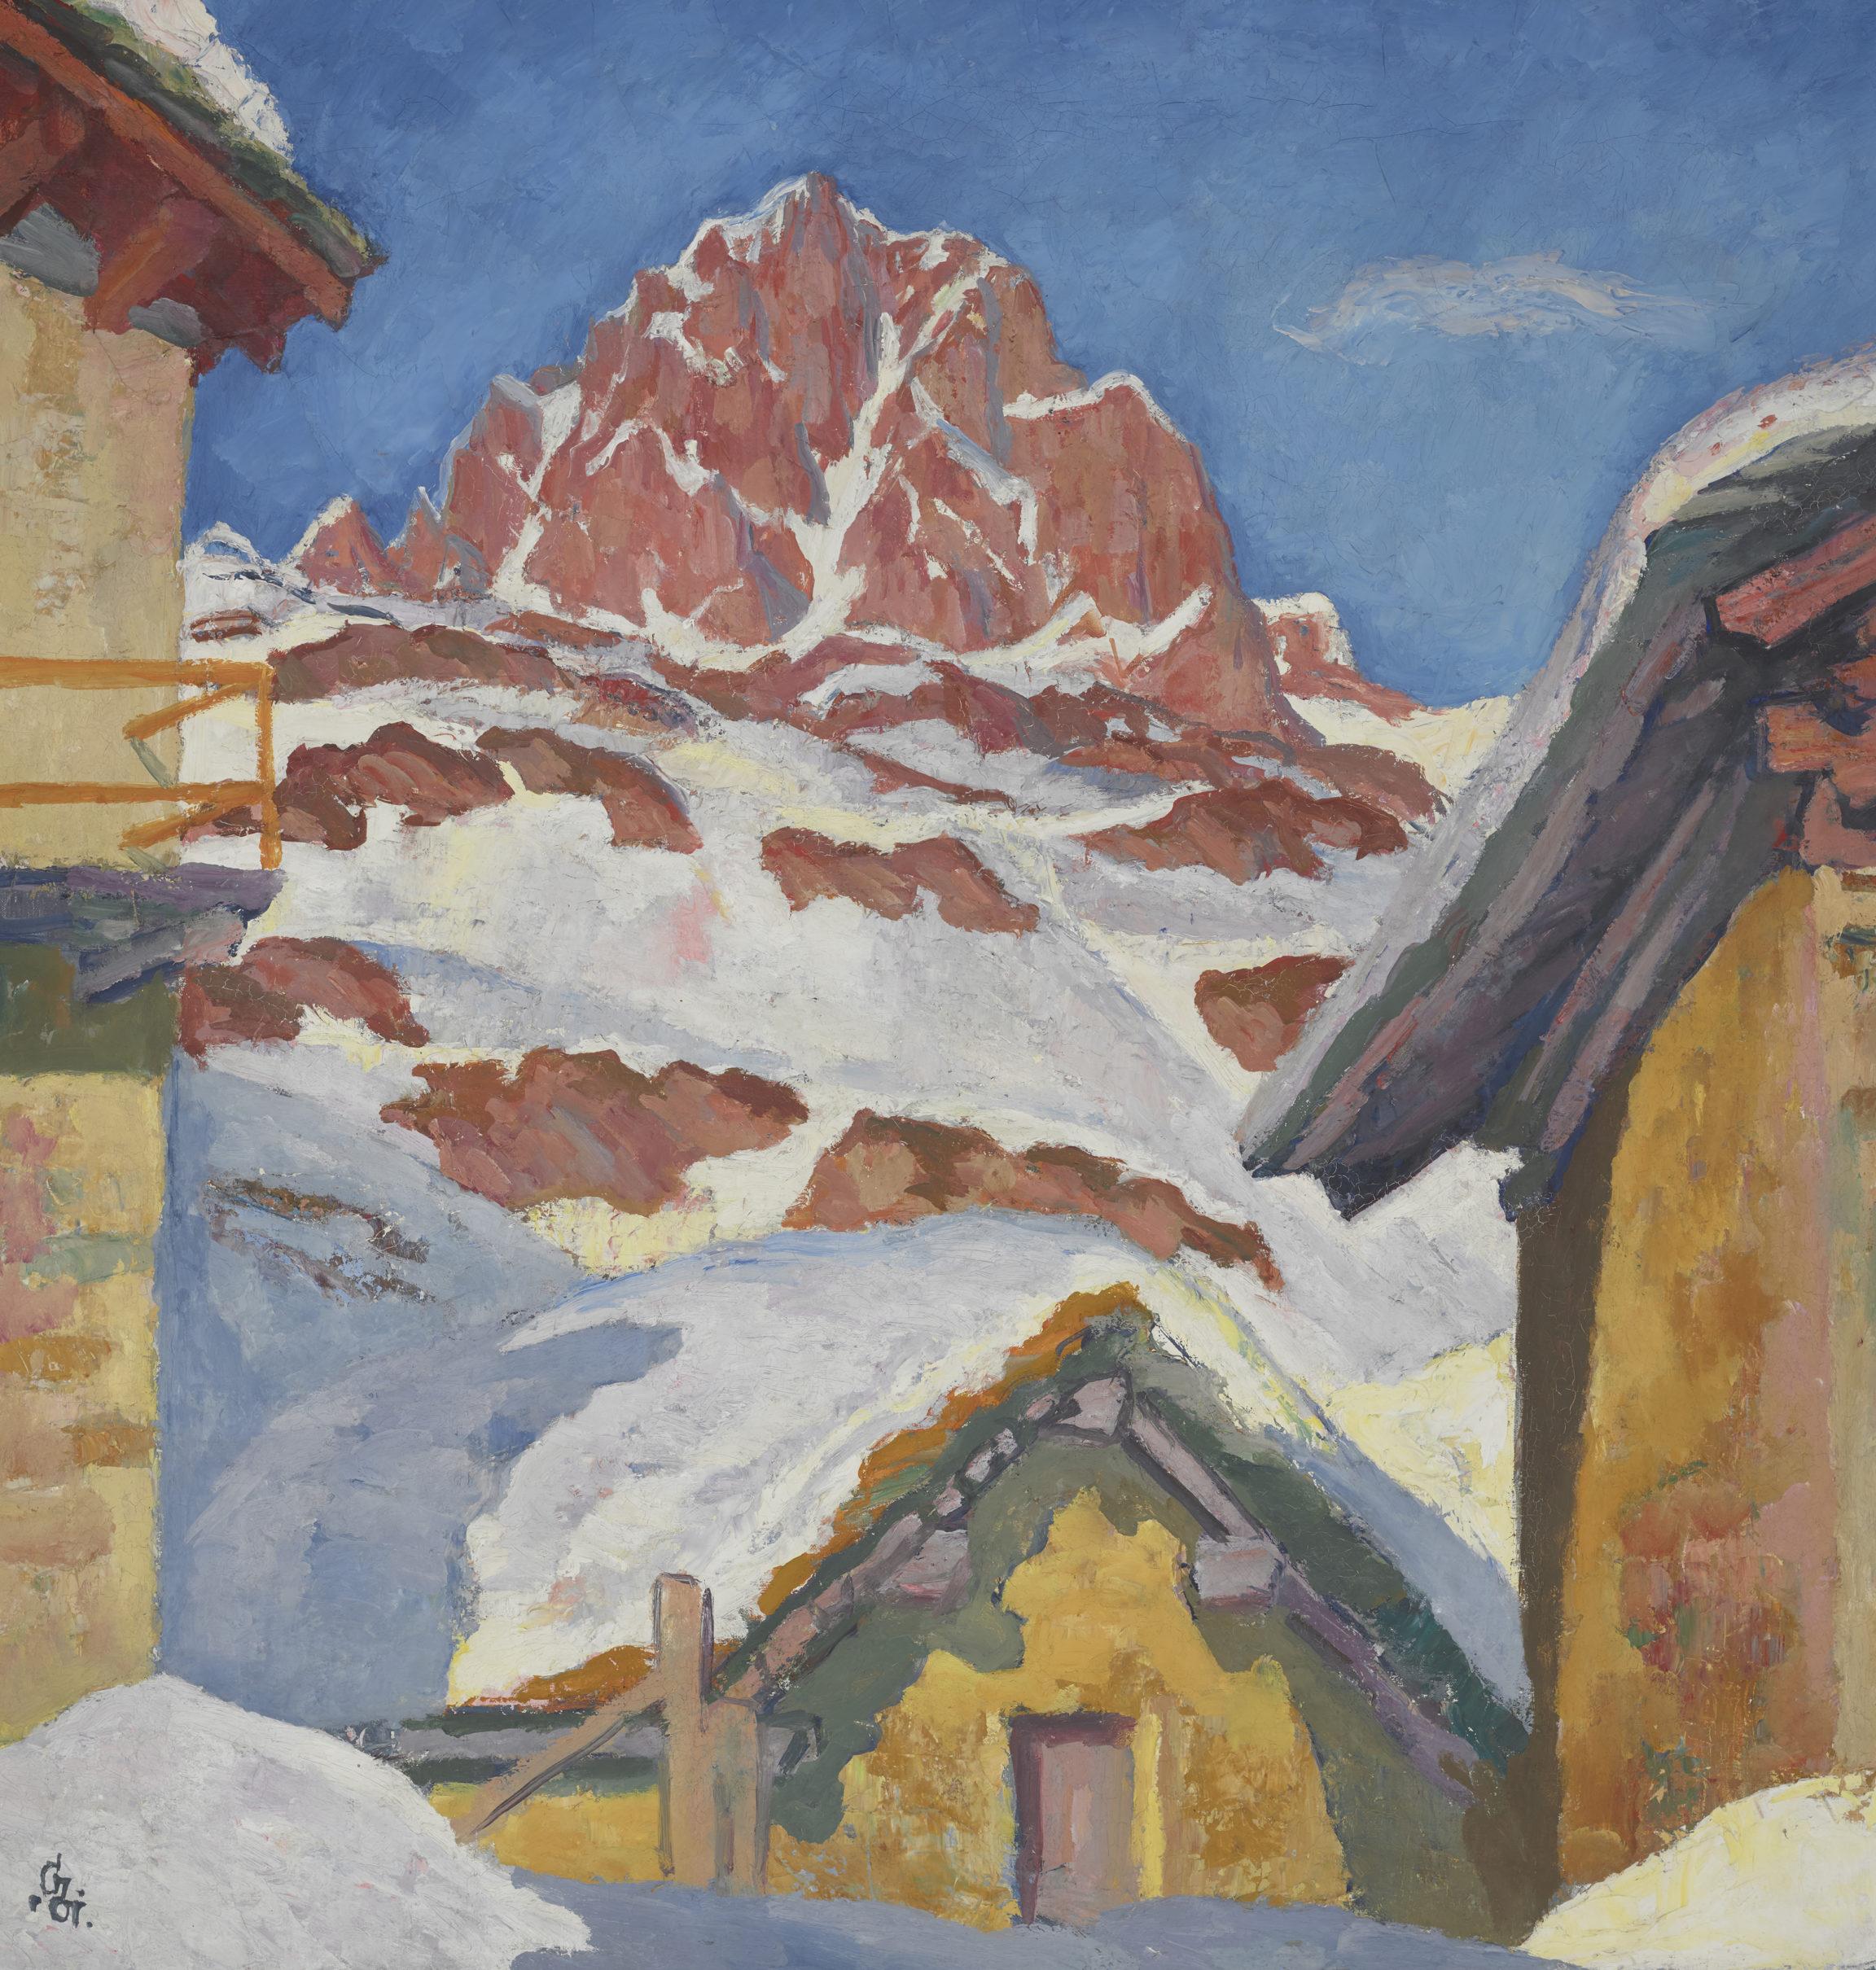 Giovanni Giacometti, Maloja en hiver ou Piz Lagrev, 1929